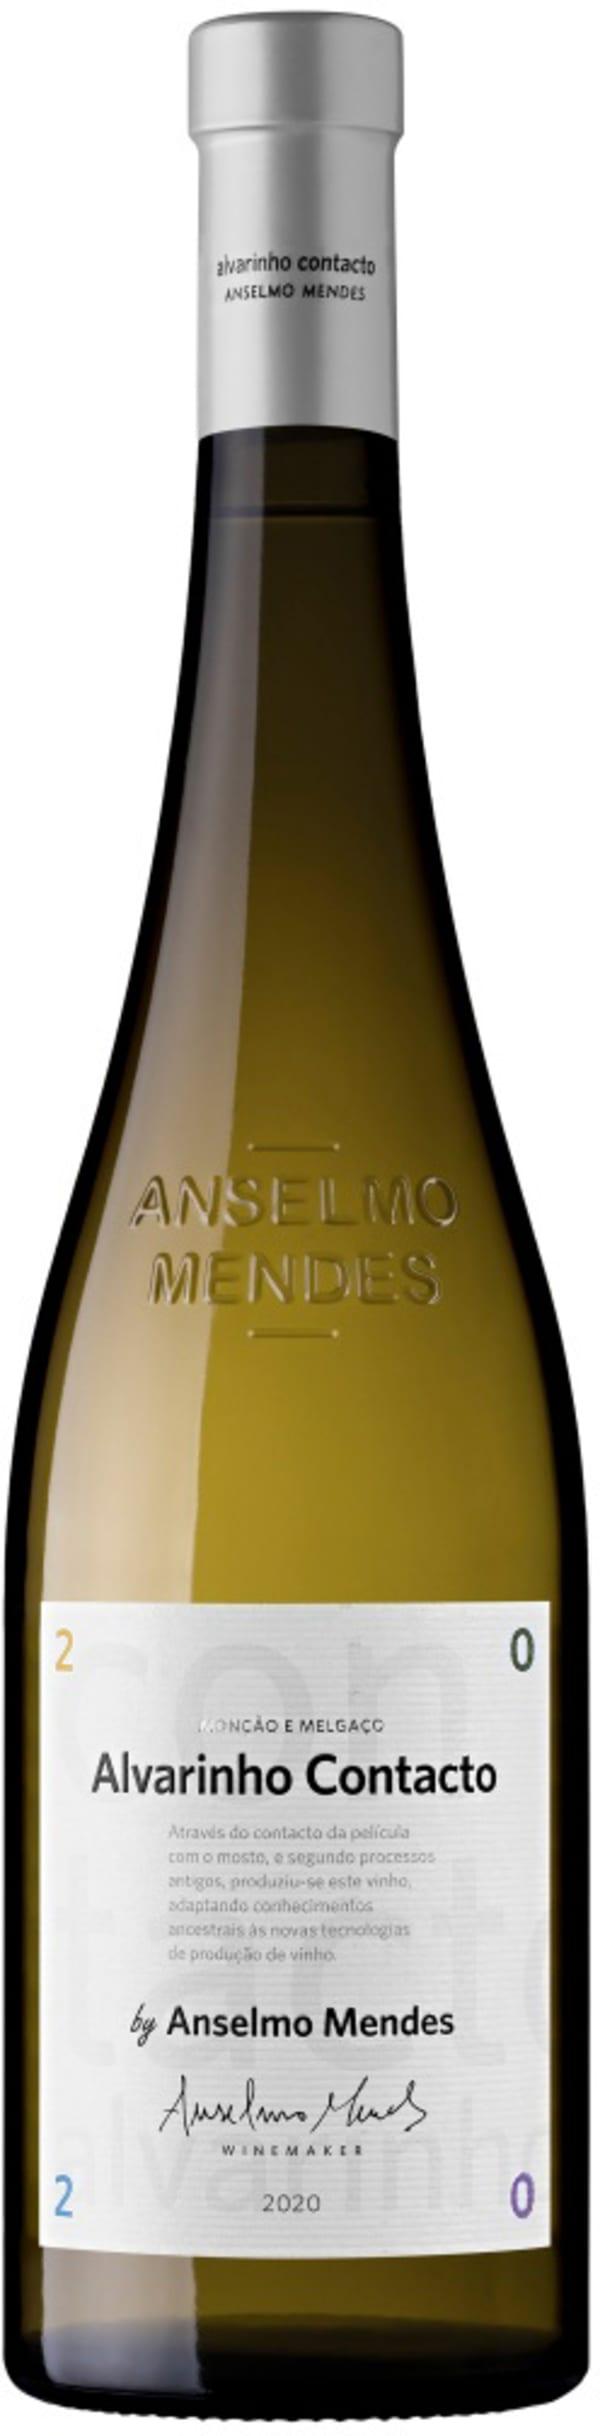 Anselmo Mendes Contacto Alvarinho 2018